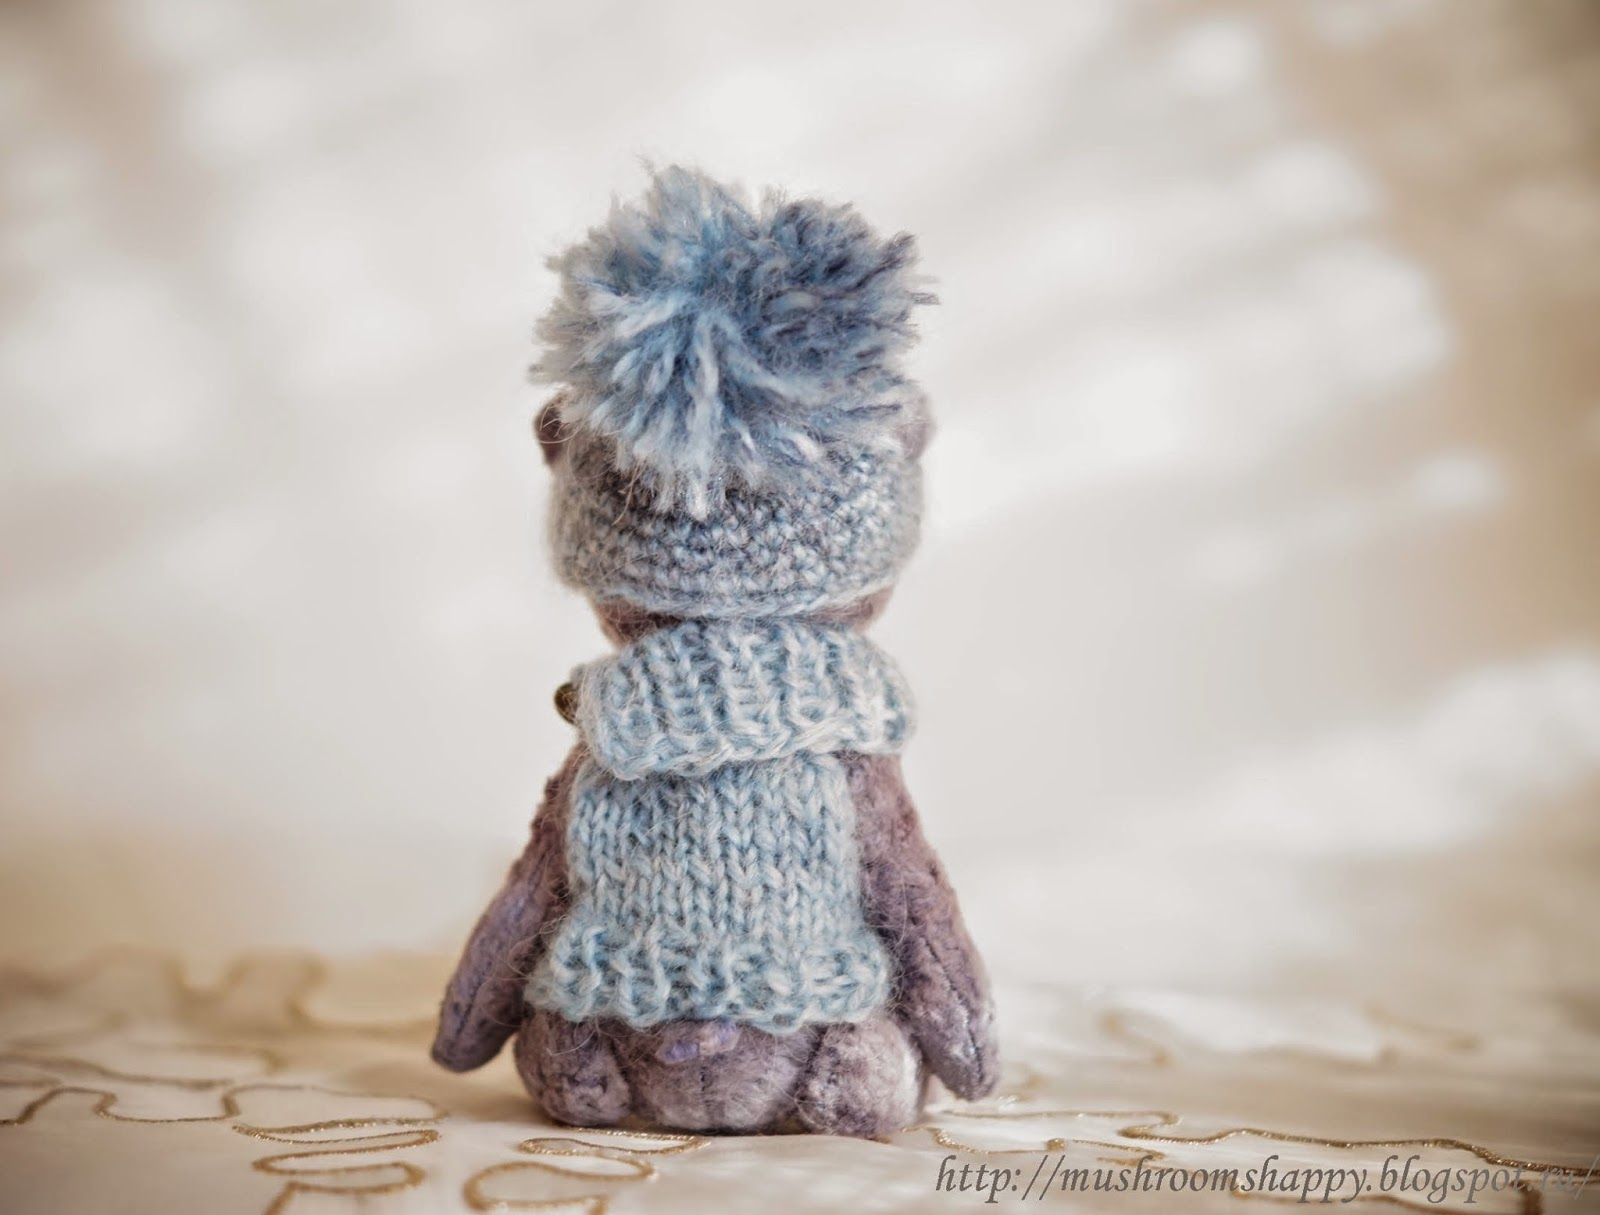 teddy-bear, мишка тедди, тедди-медведь, хвост